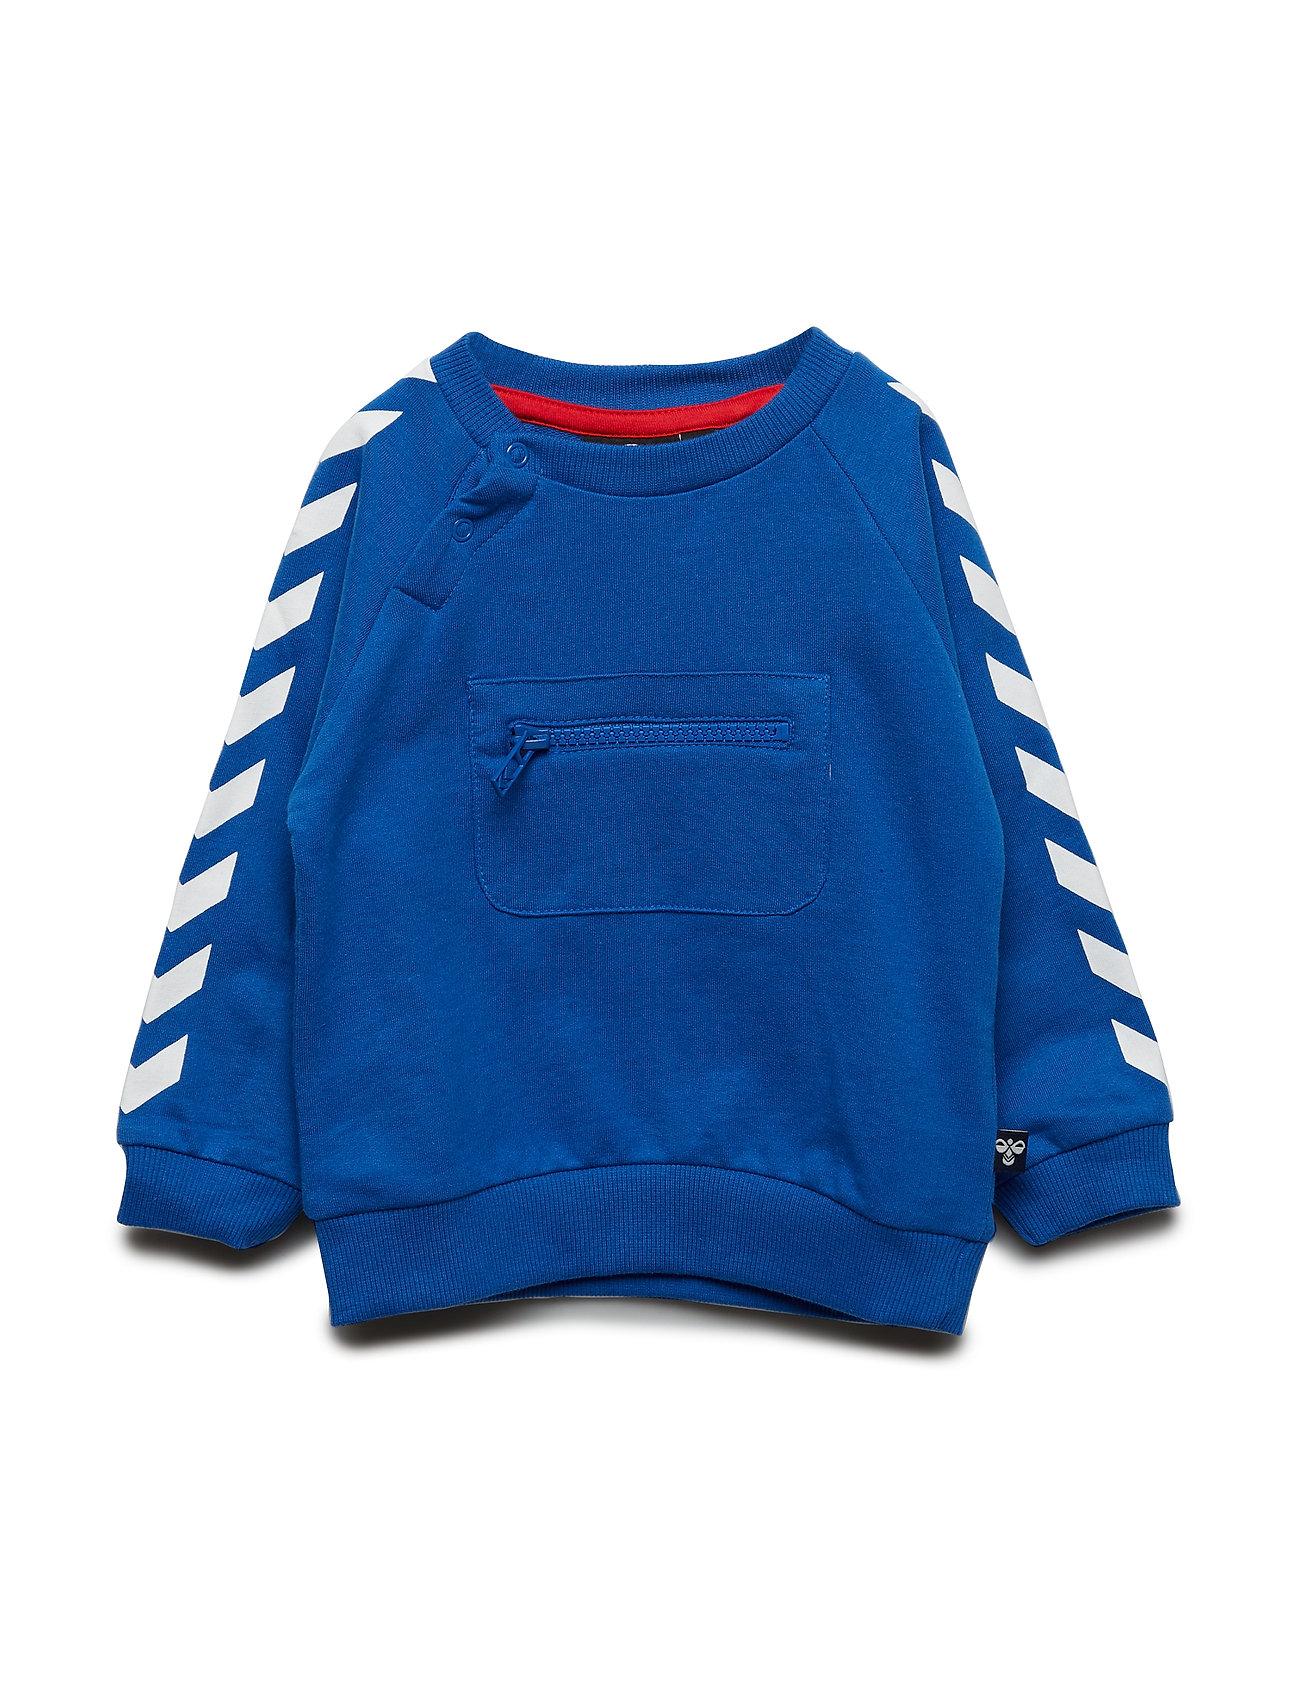 Hmlvinnie Sweatshirt Sweatshirt Trøje Blå Hummel